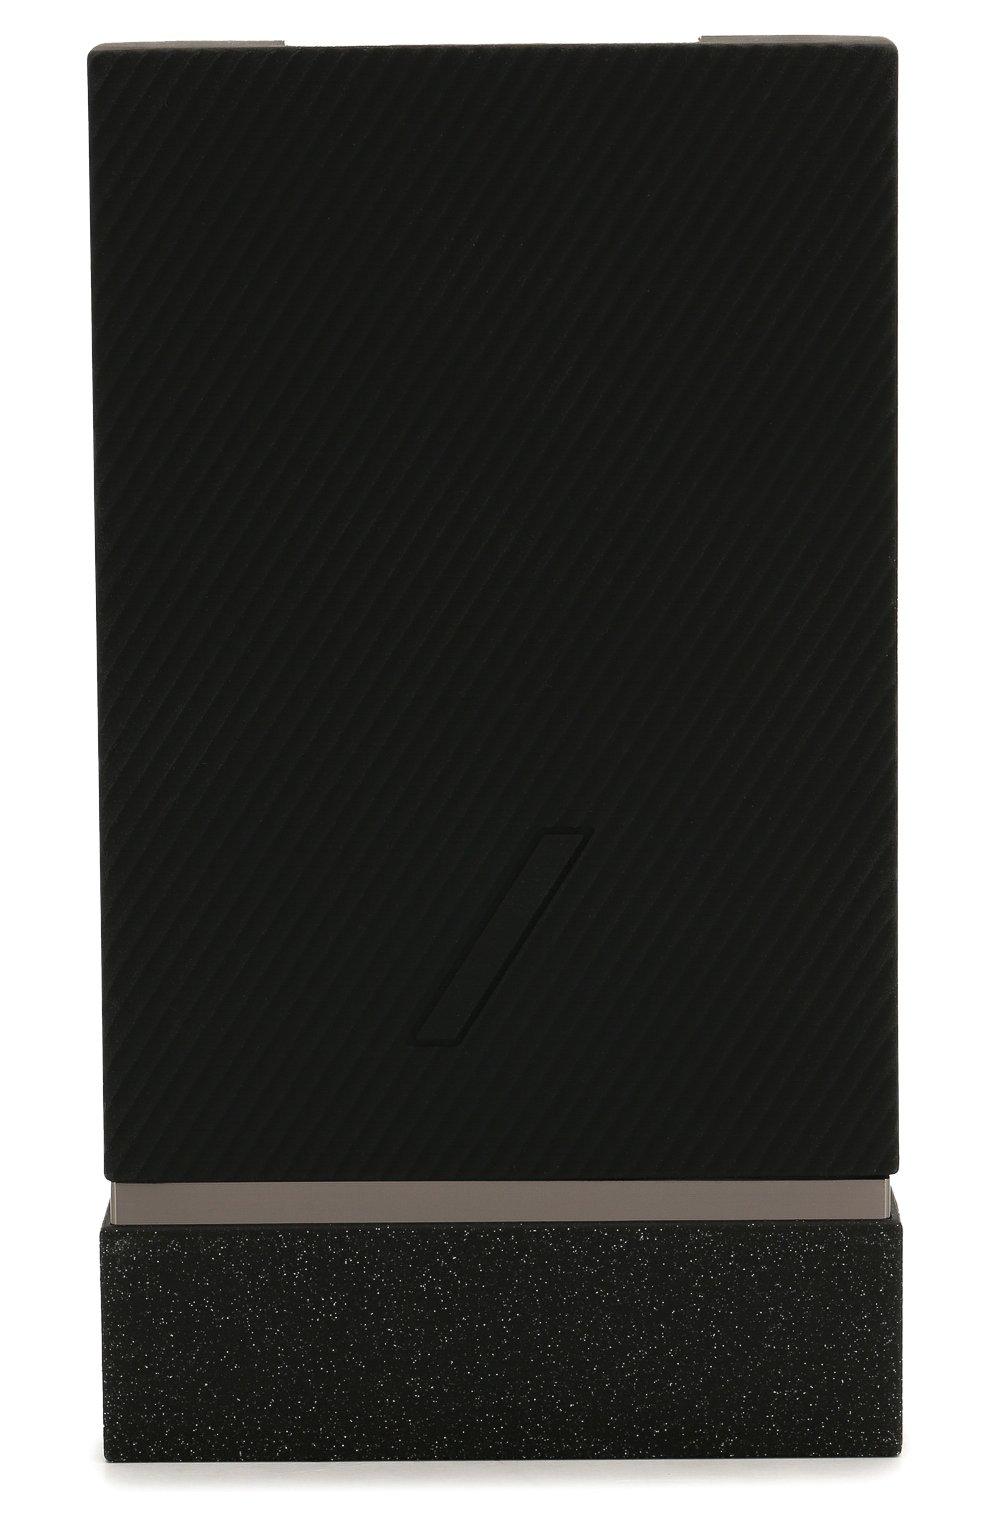 Сетевое зарядное устройство smart charger usb-a/usb-c NATIVE UNION серого цвета, арт. SMART-PD-GRY-INT   Фото 1